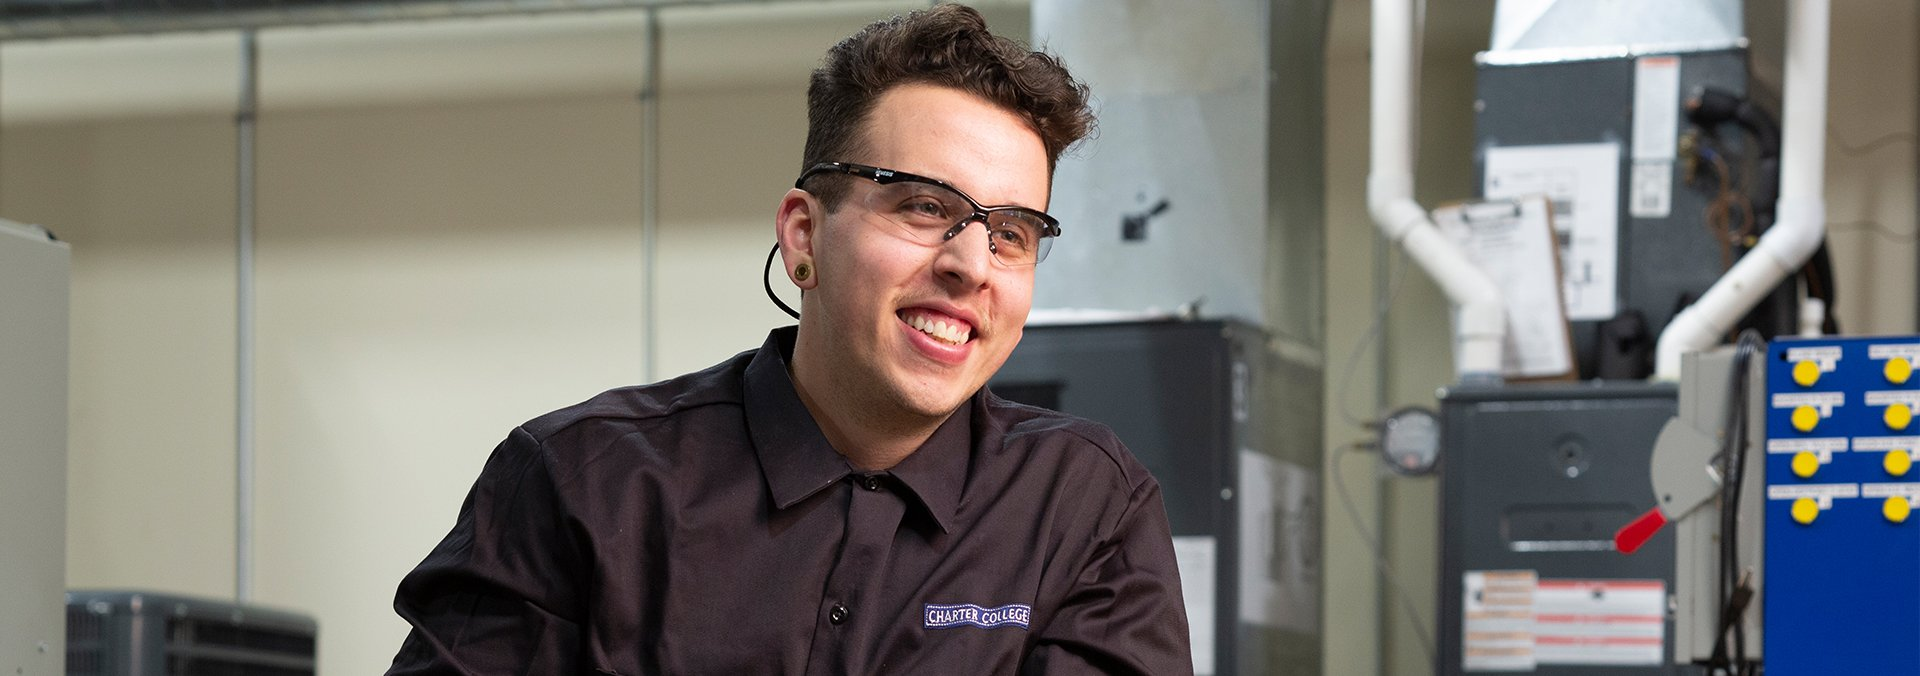 Aaron HVAC student